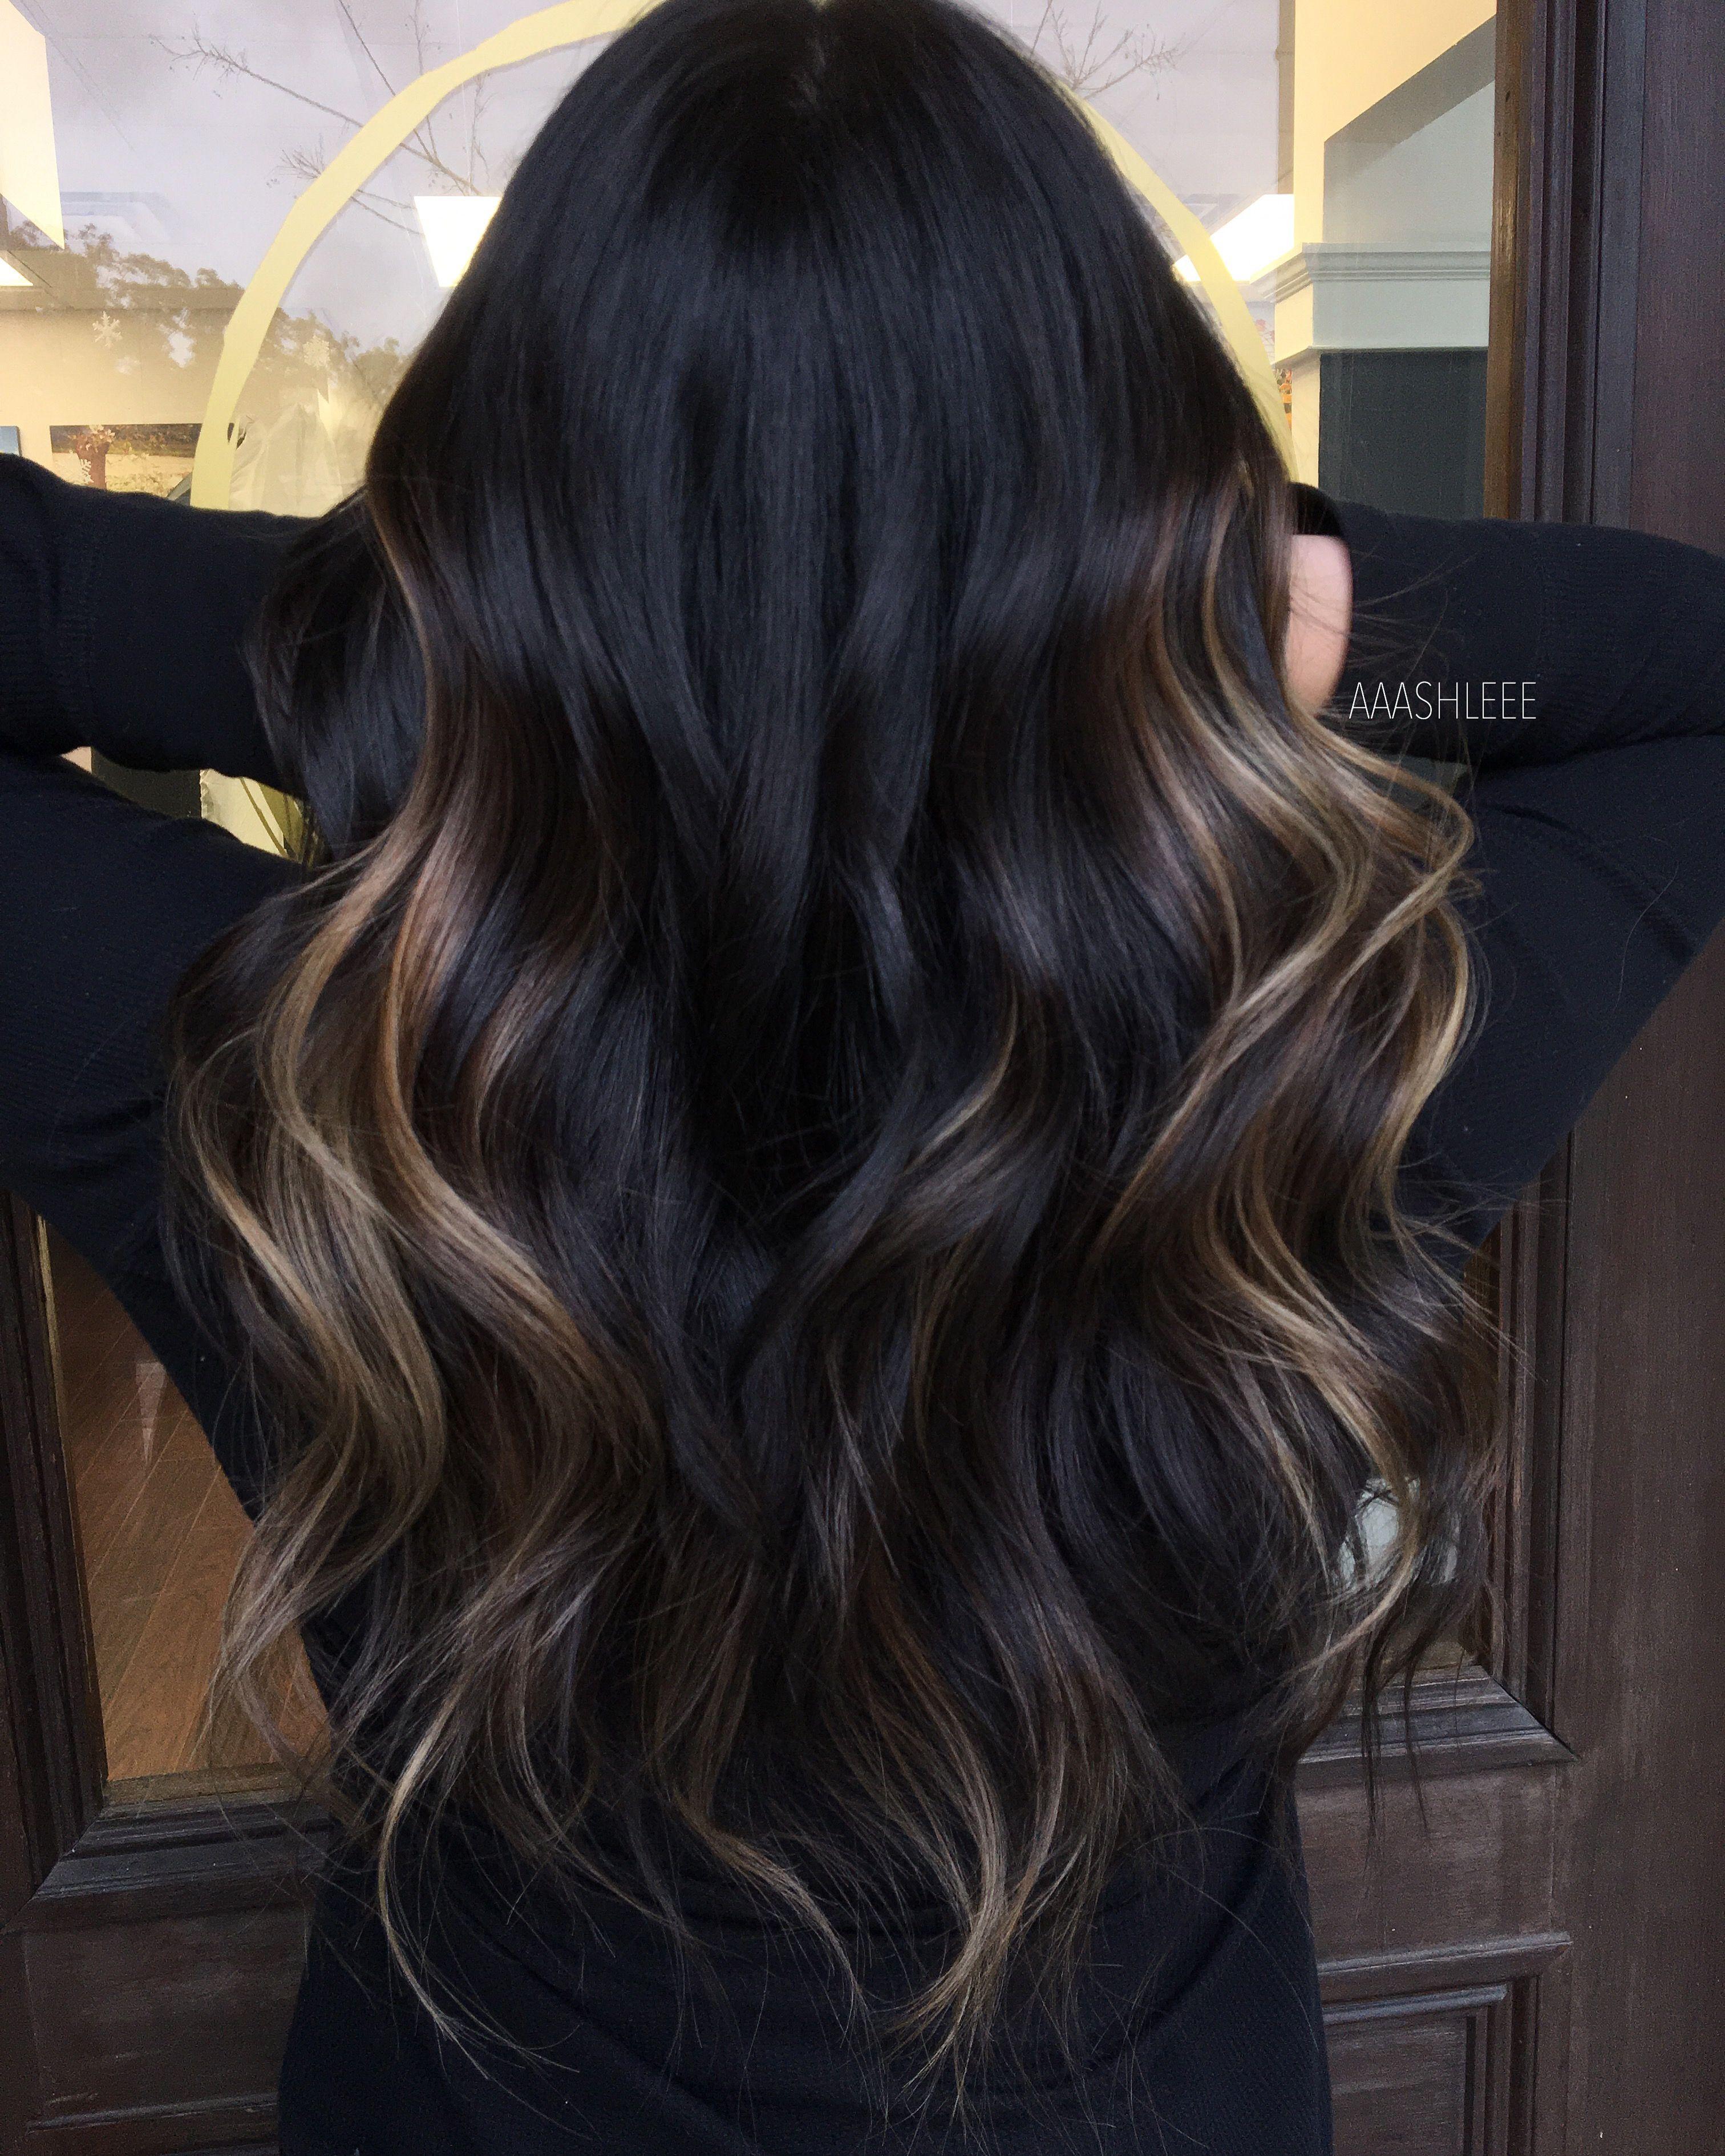 Ombre Balayage Brown Hair Brunette Brown Hair Balayage Subtle Long Hair Beach Waves Curls Winter Hair Dar Hair Color Unique Long Hair Color Black Hair Balayage